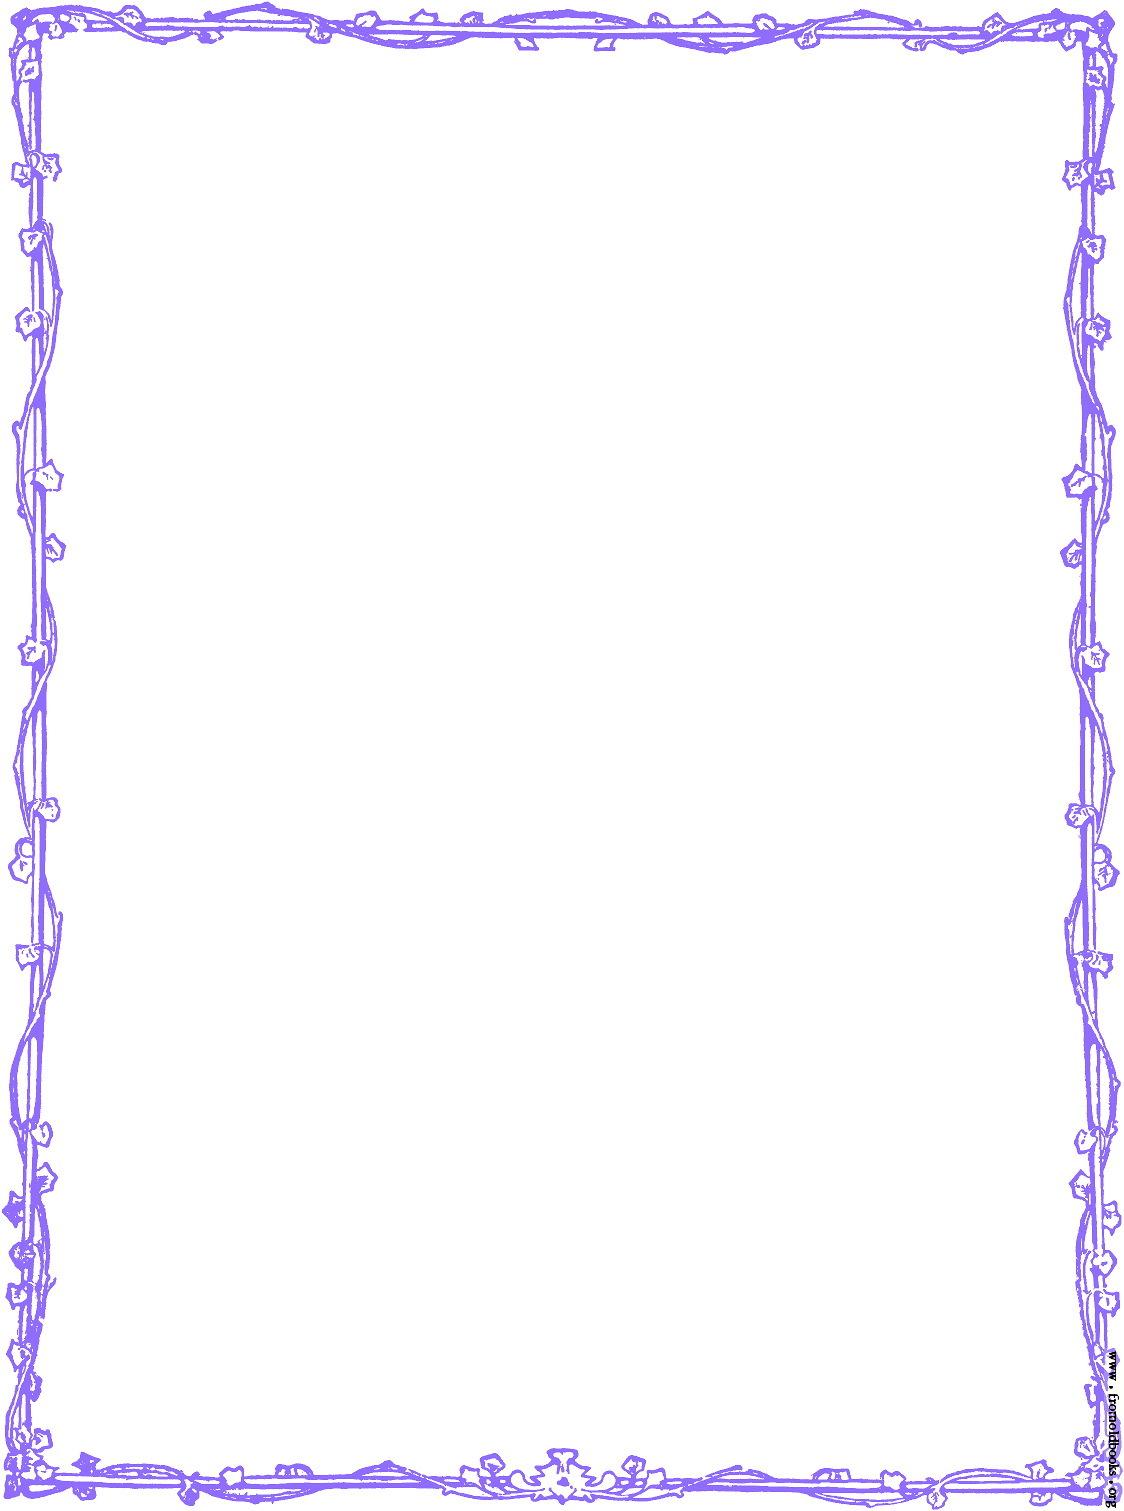 13 Purple Border Design Images.